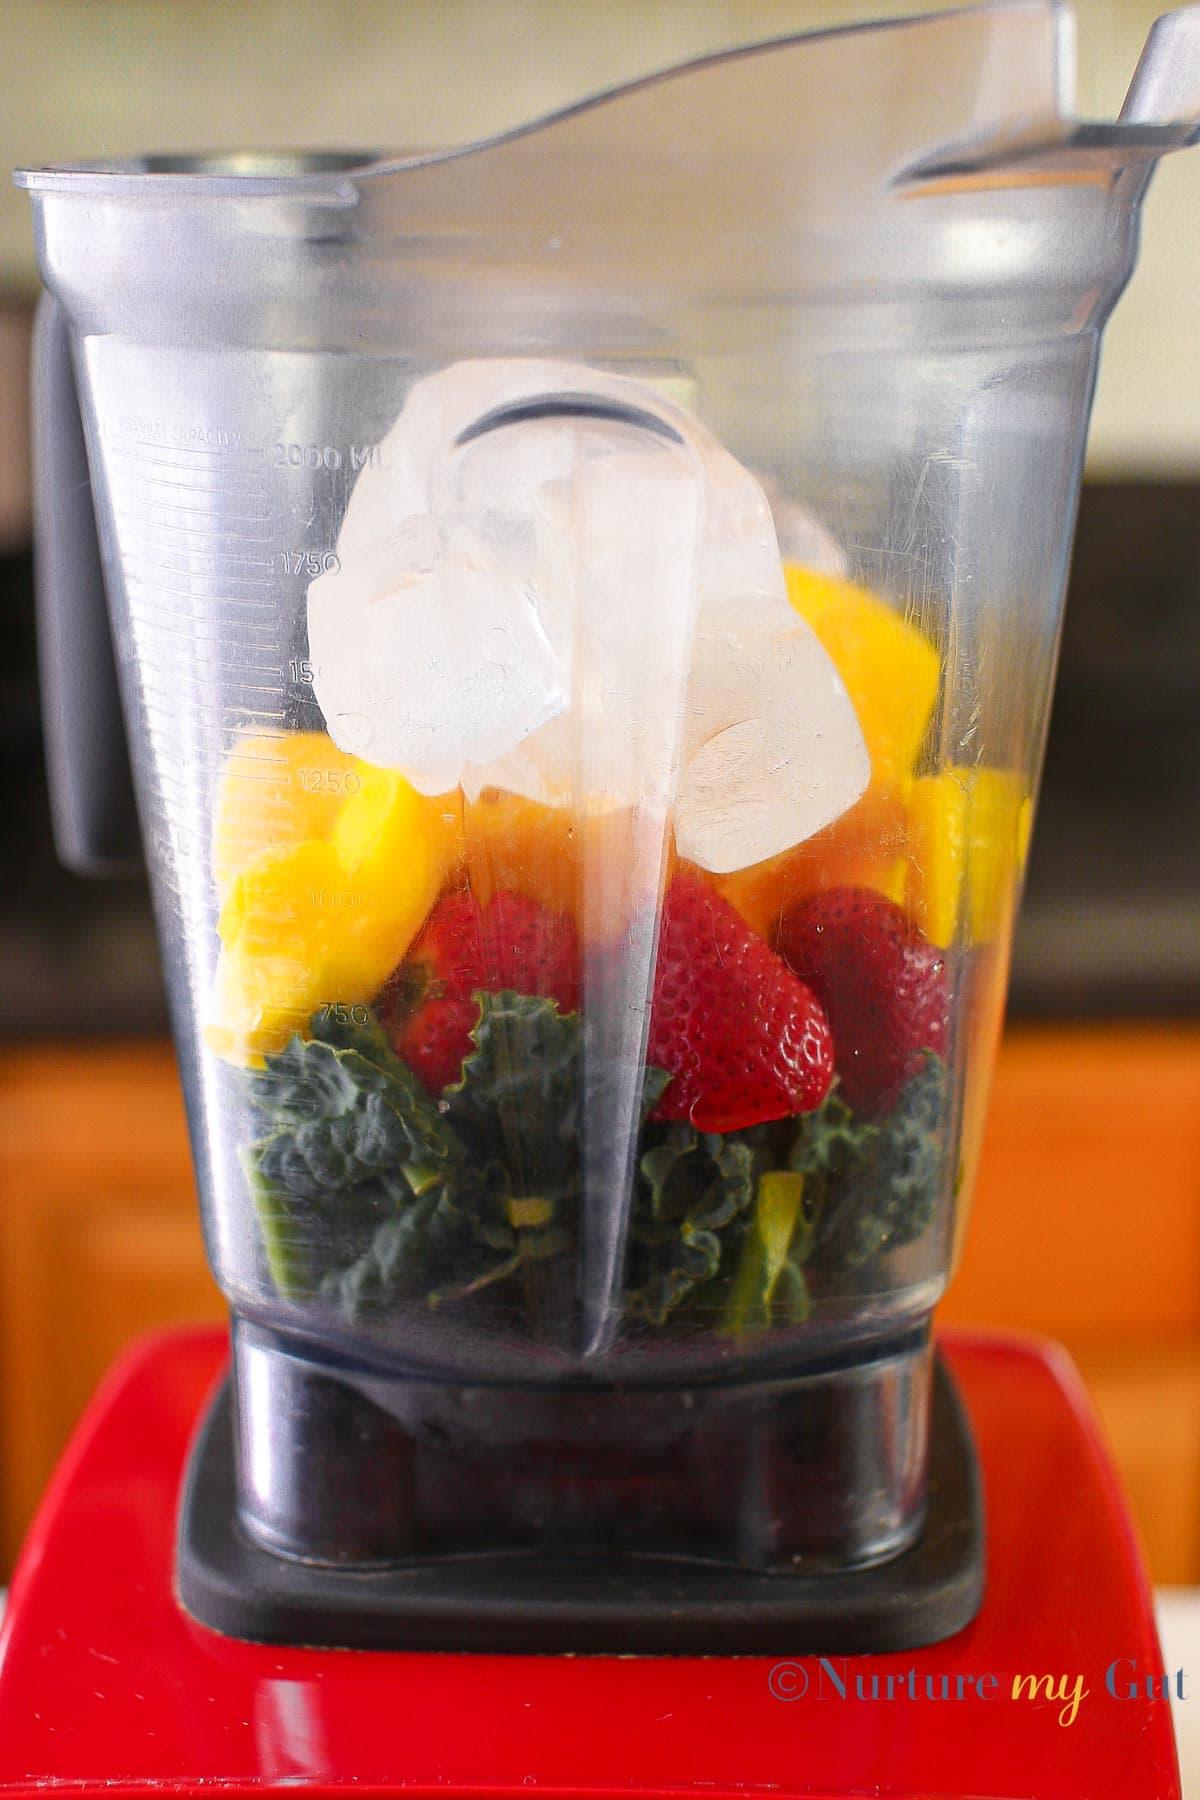 smoothie ingredients in blender with red base